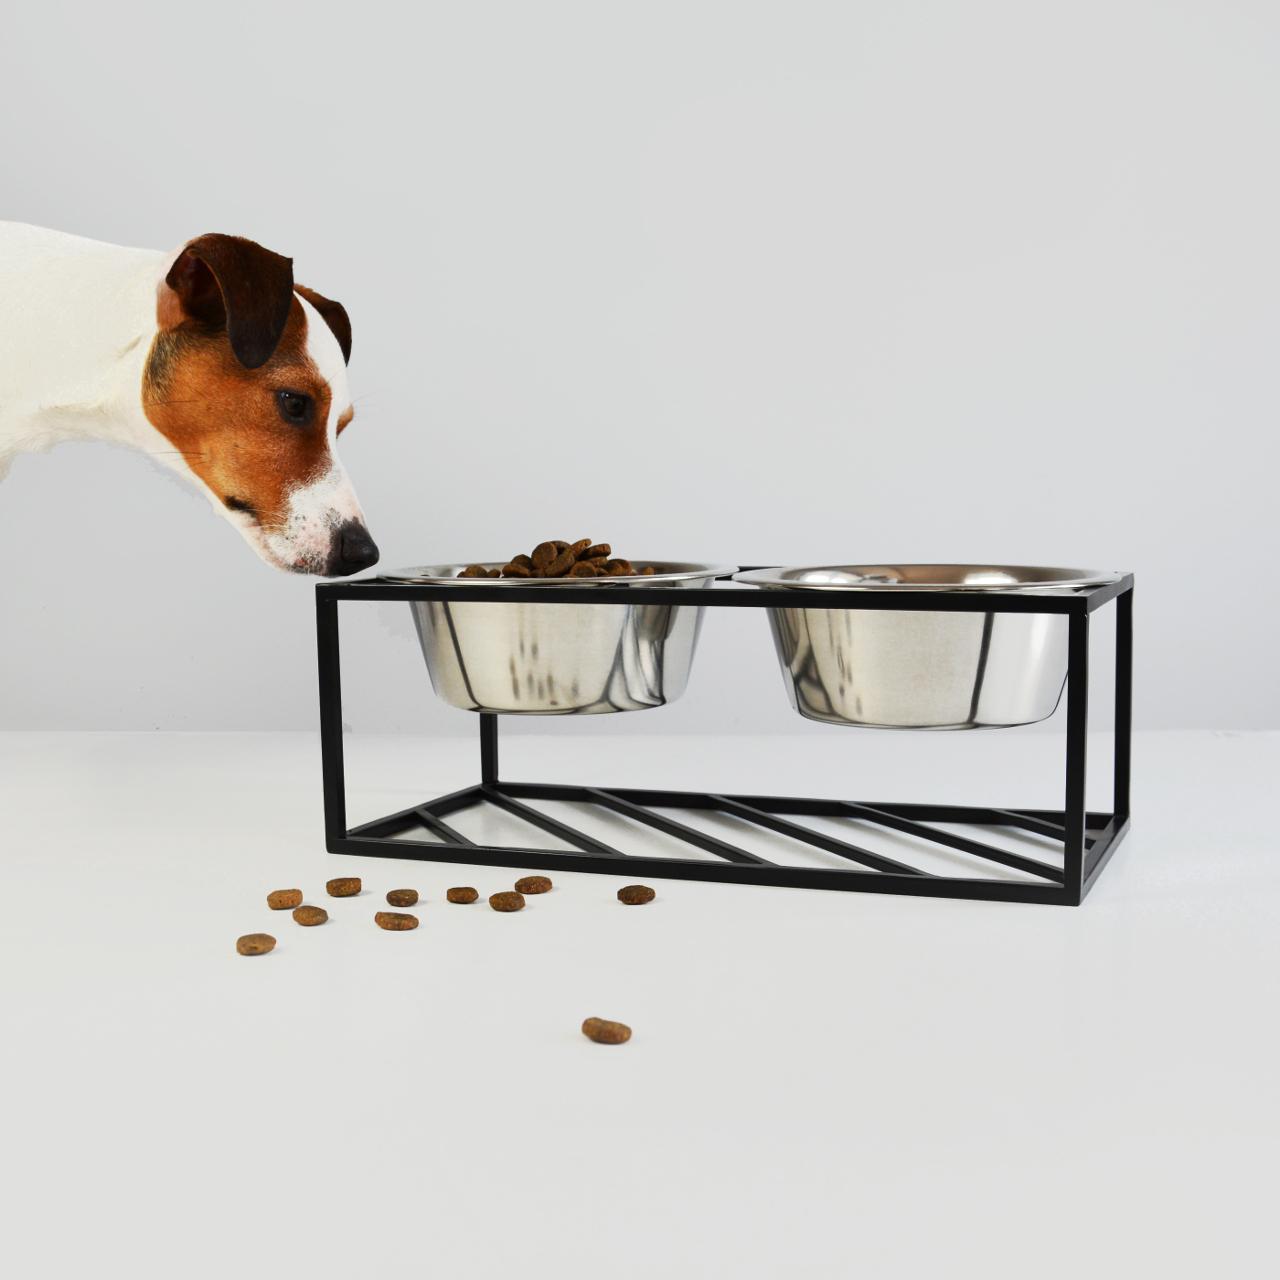 Minimalist Raised Pet Feeder from HELLO PETS